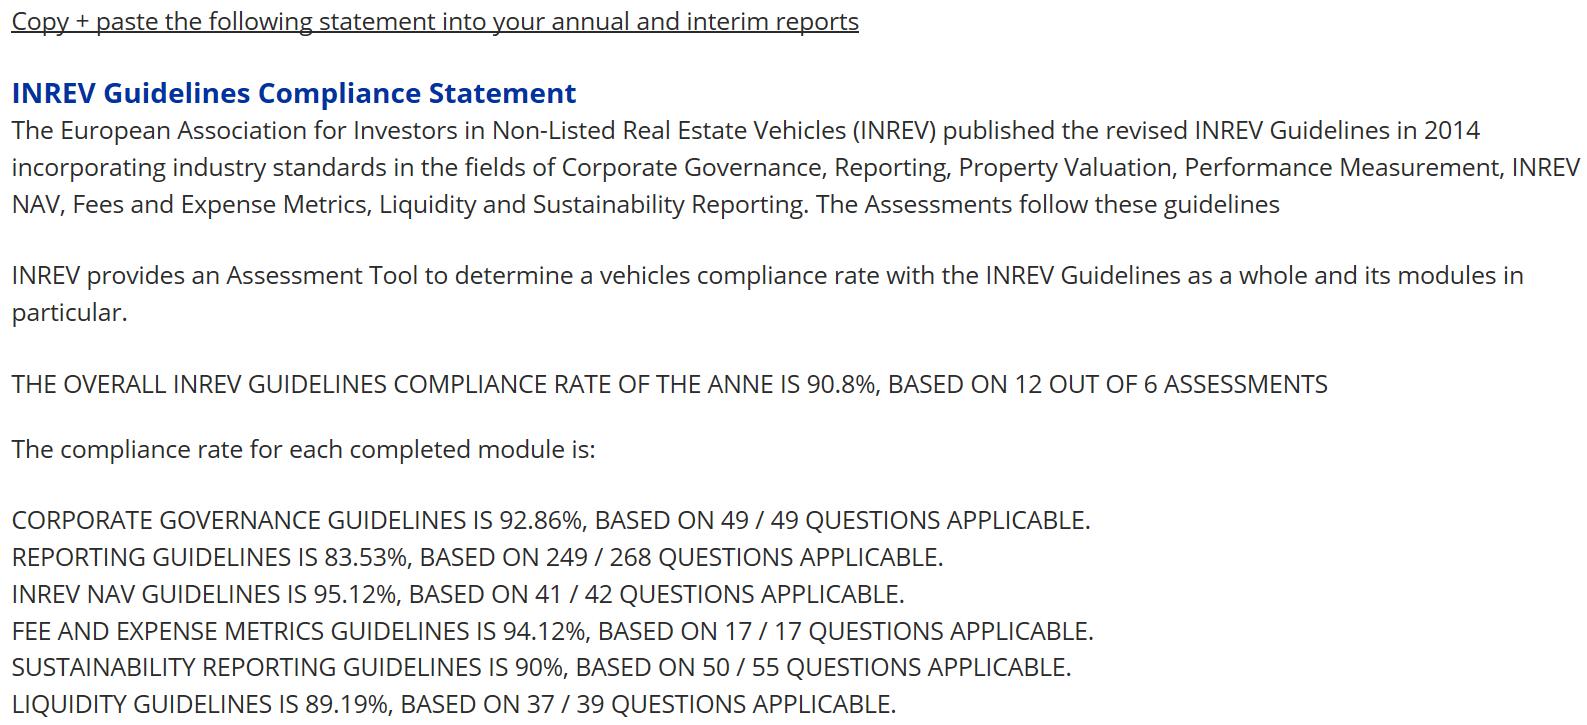 INREV Guidelines - INREV Guidelines